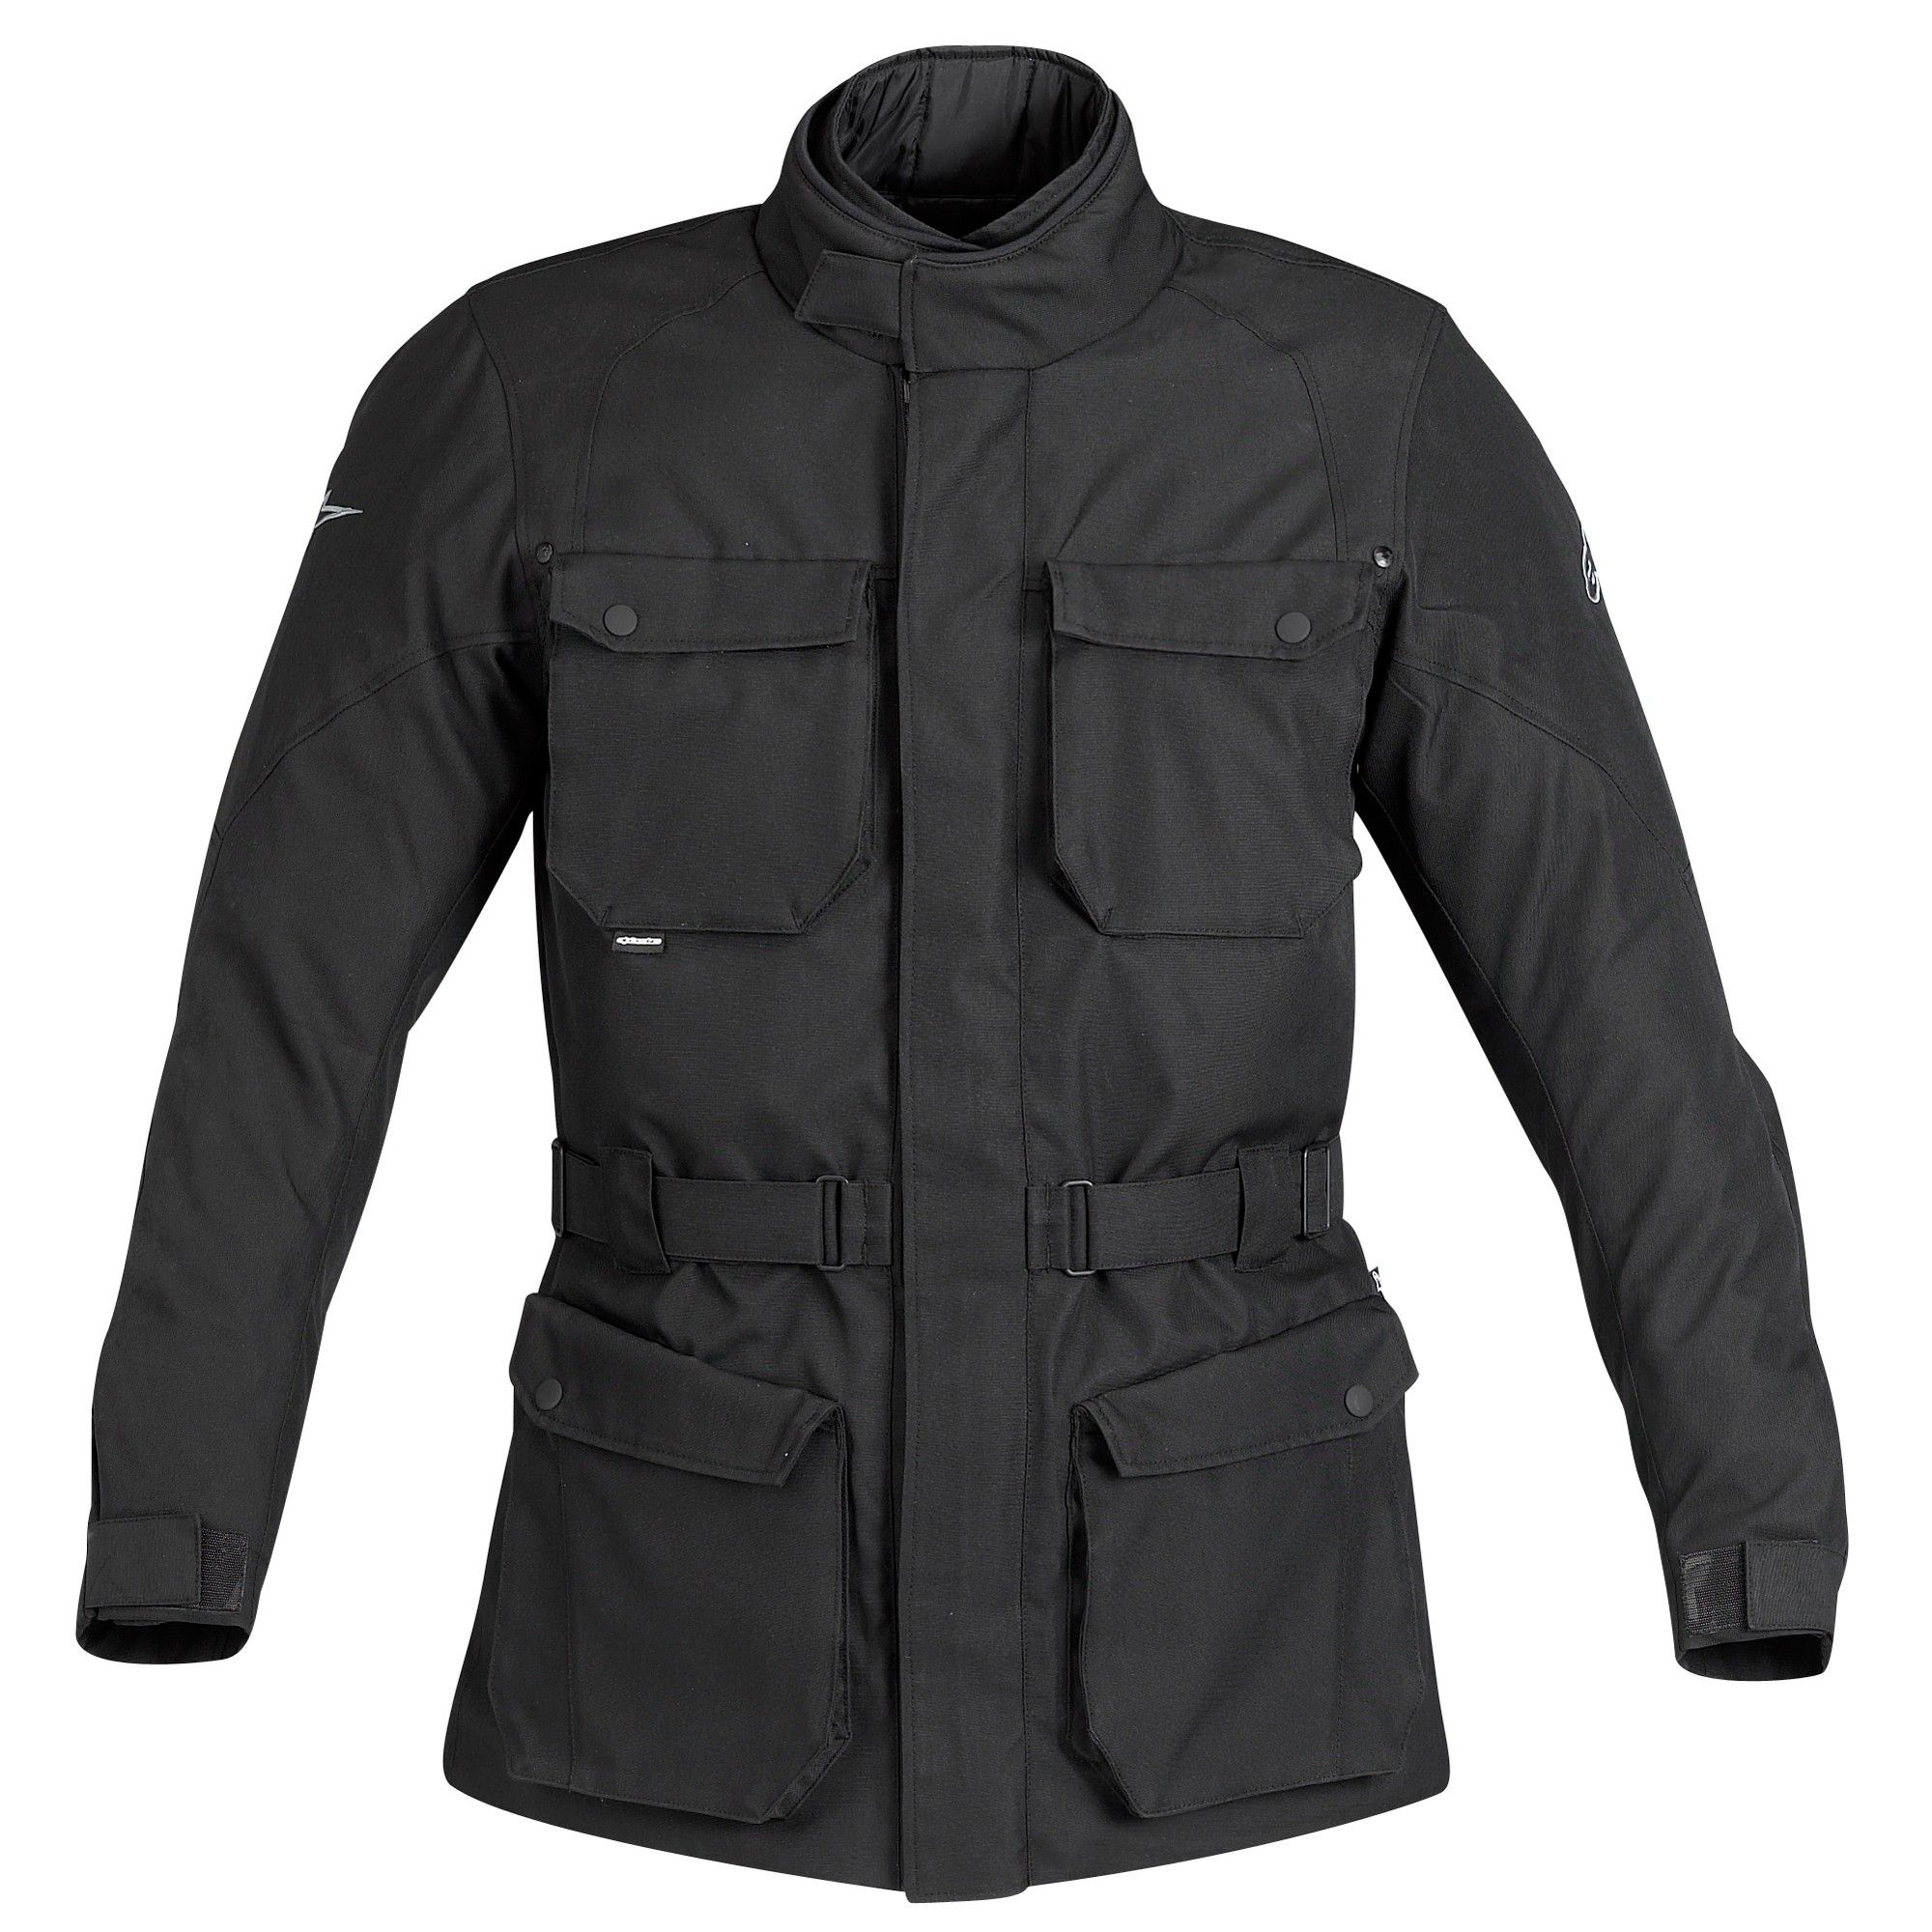 Alpinestars Racing Replica 1 Piece Leather Suit Jackets